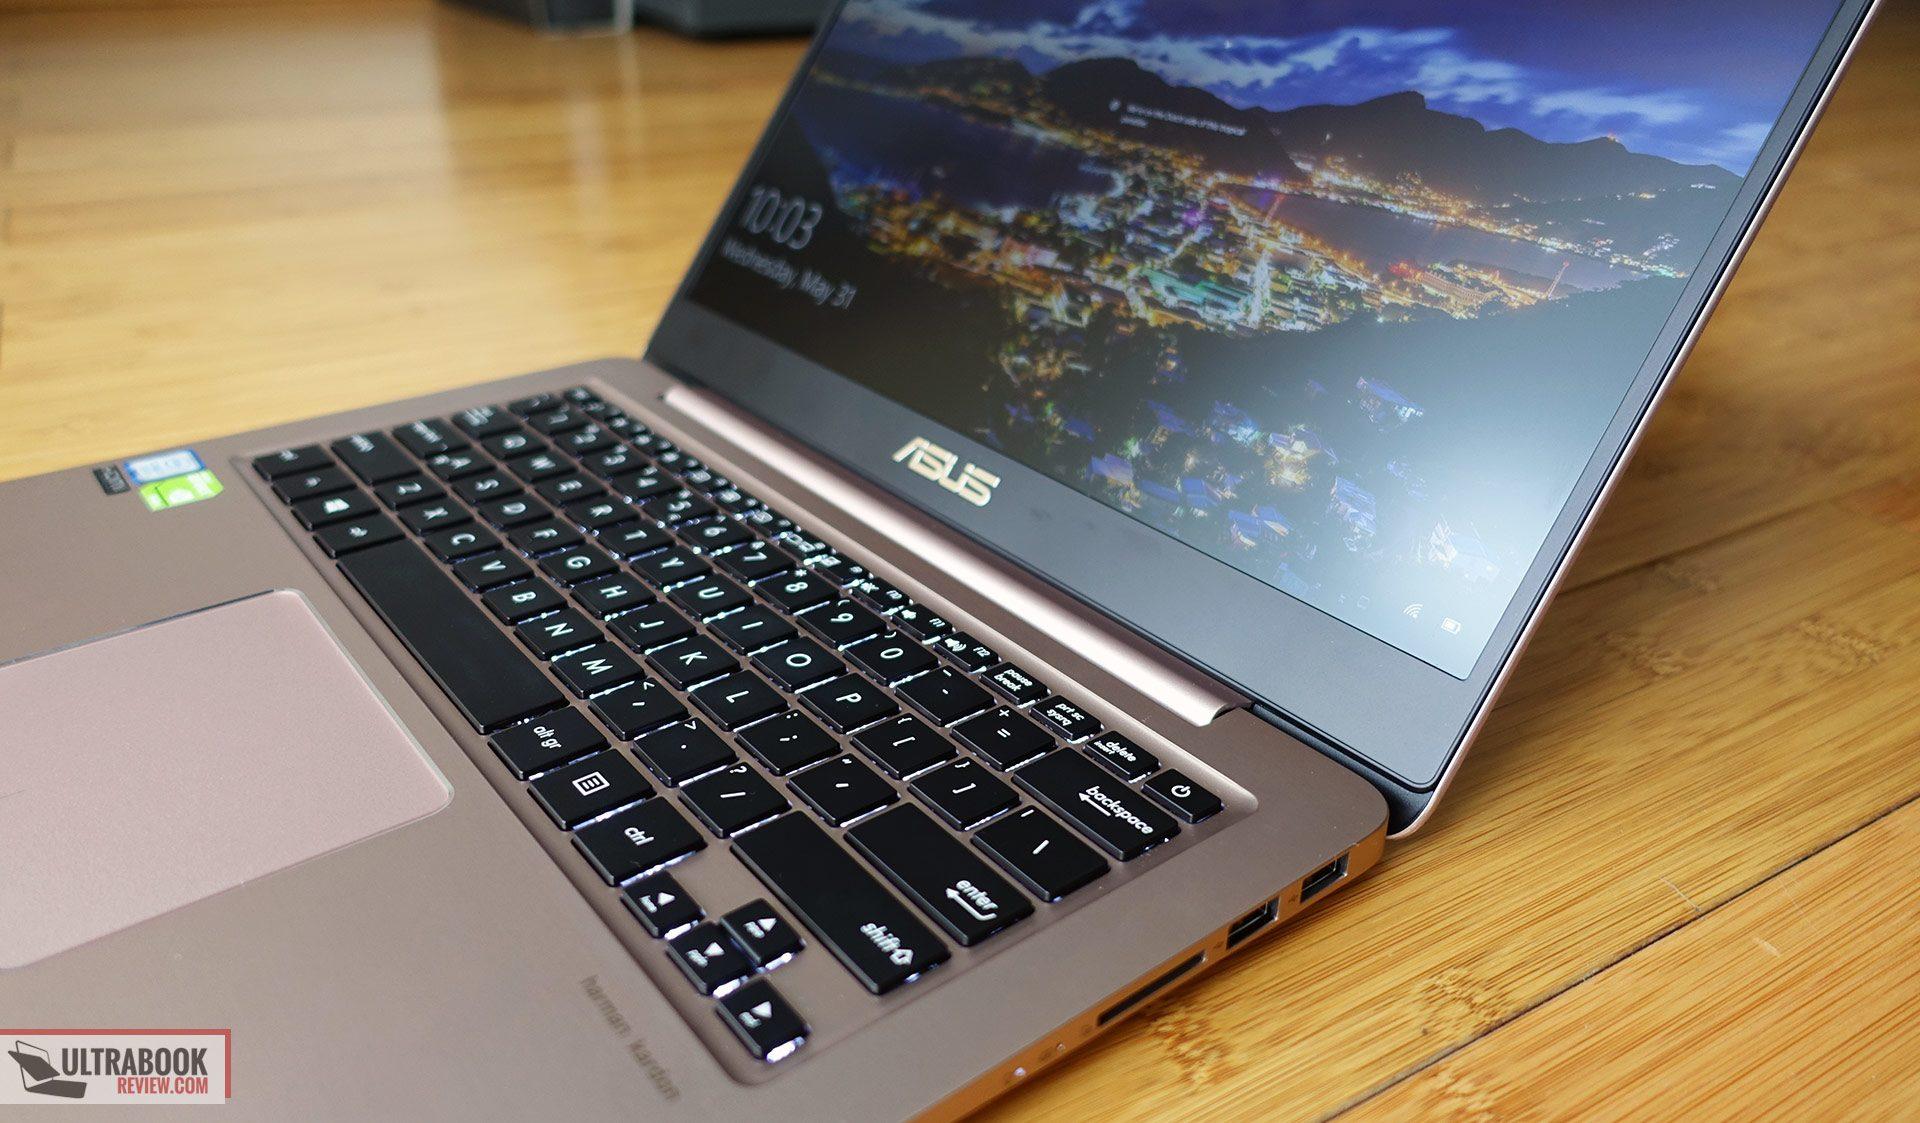 Asus Zenbook Ux410uq Ux3410uq Review Multimedia Notebook In A